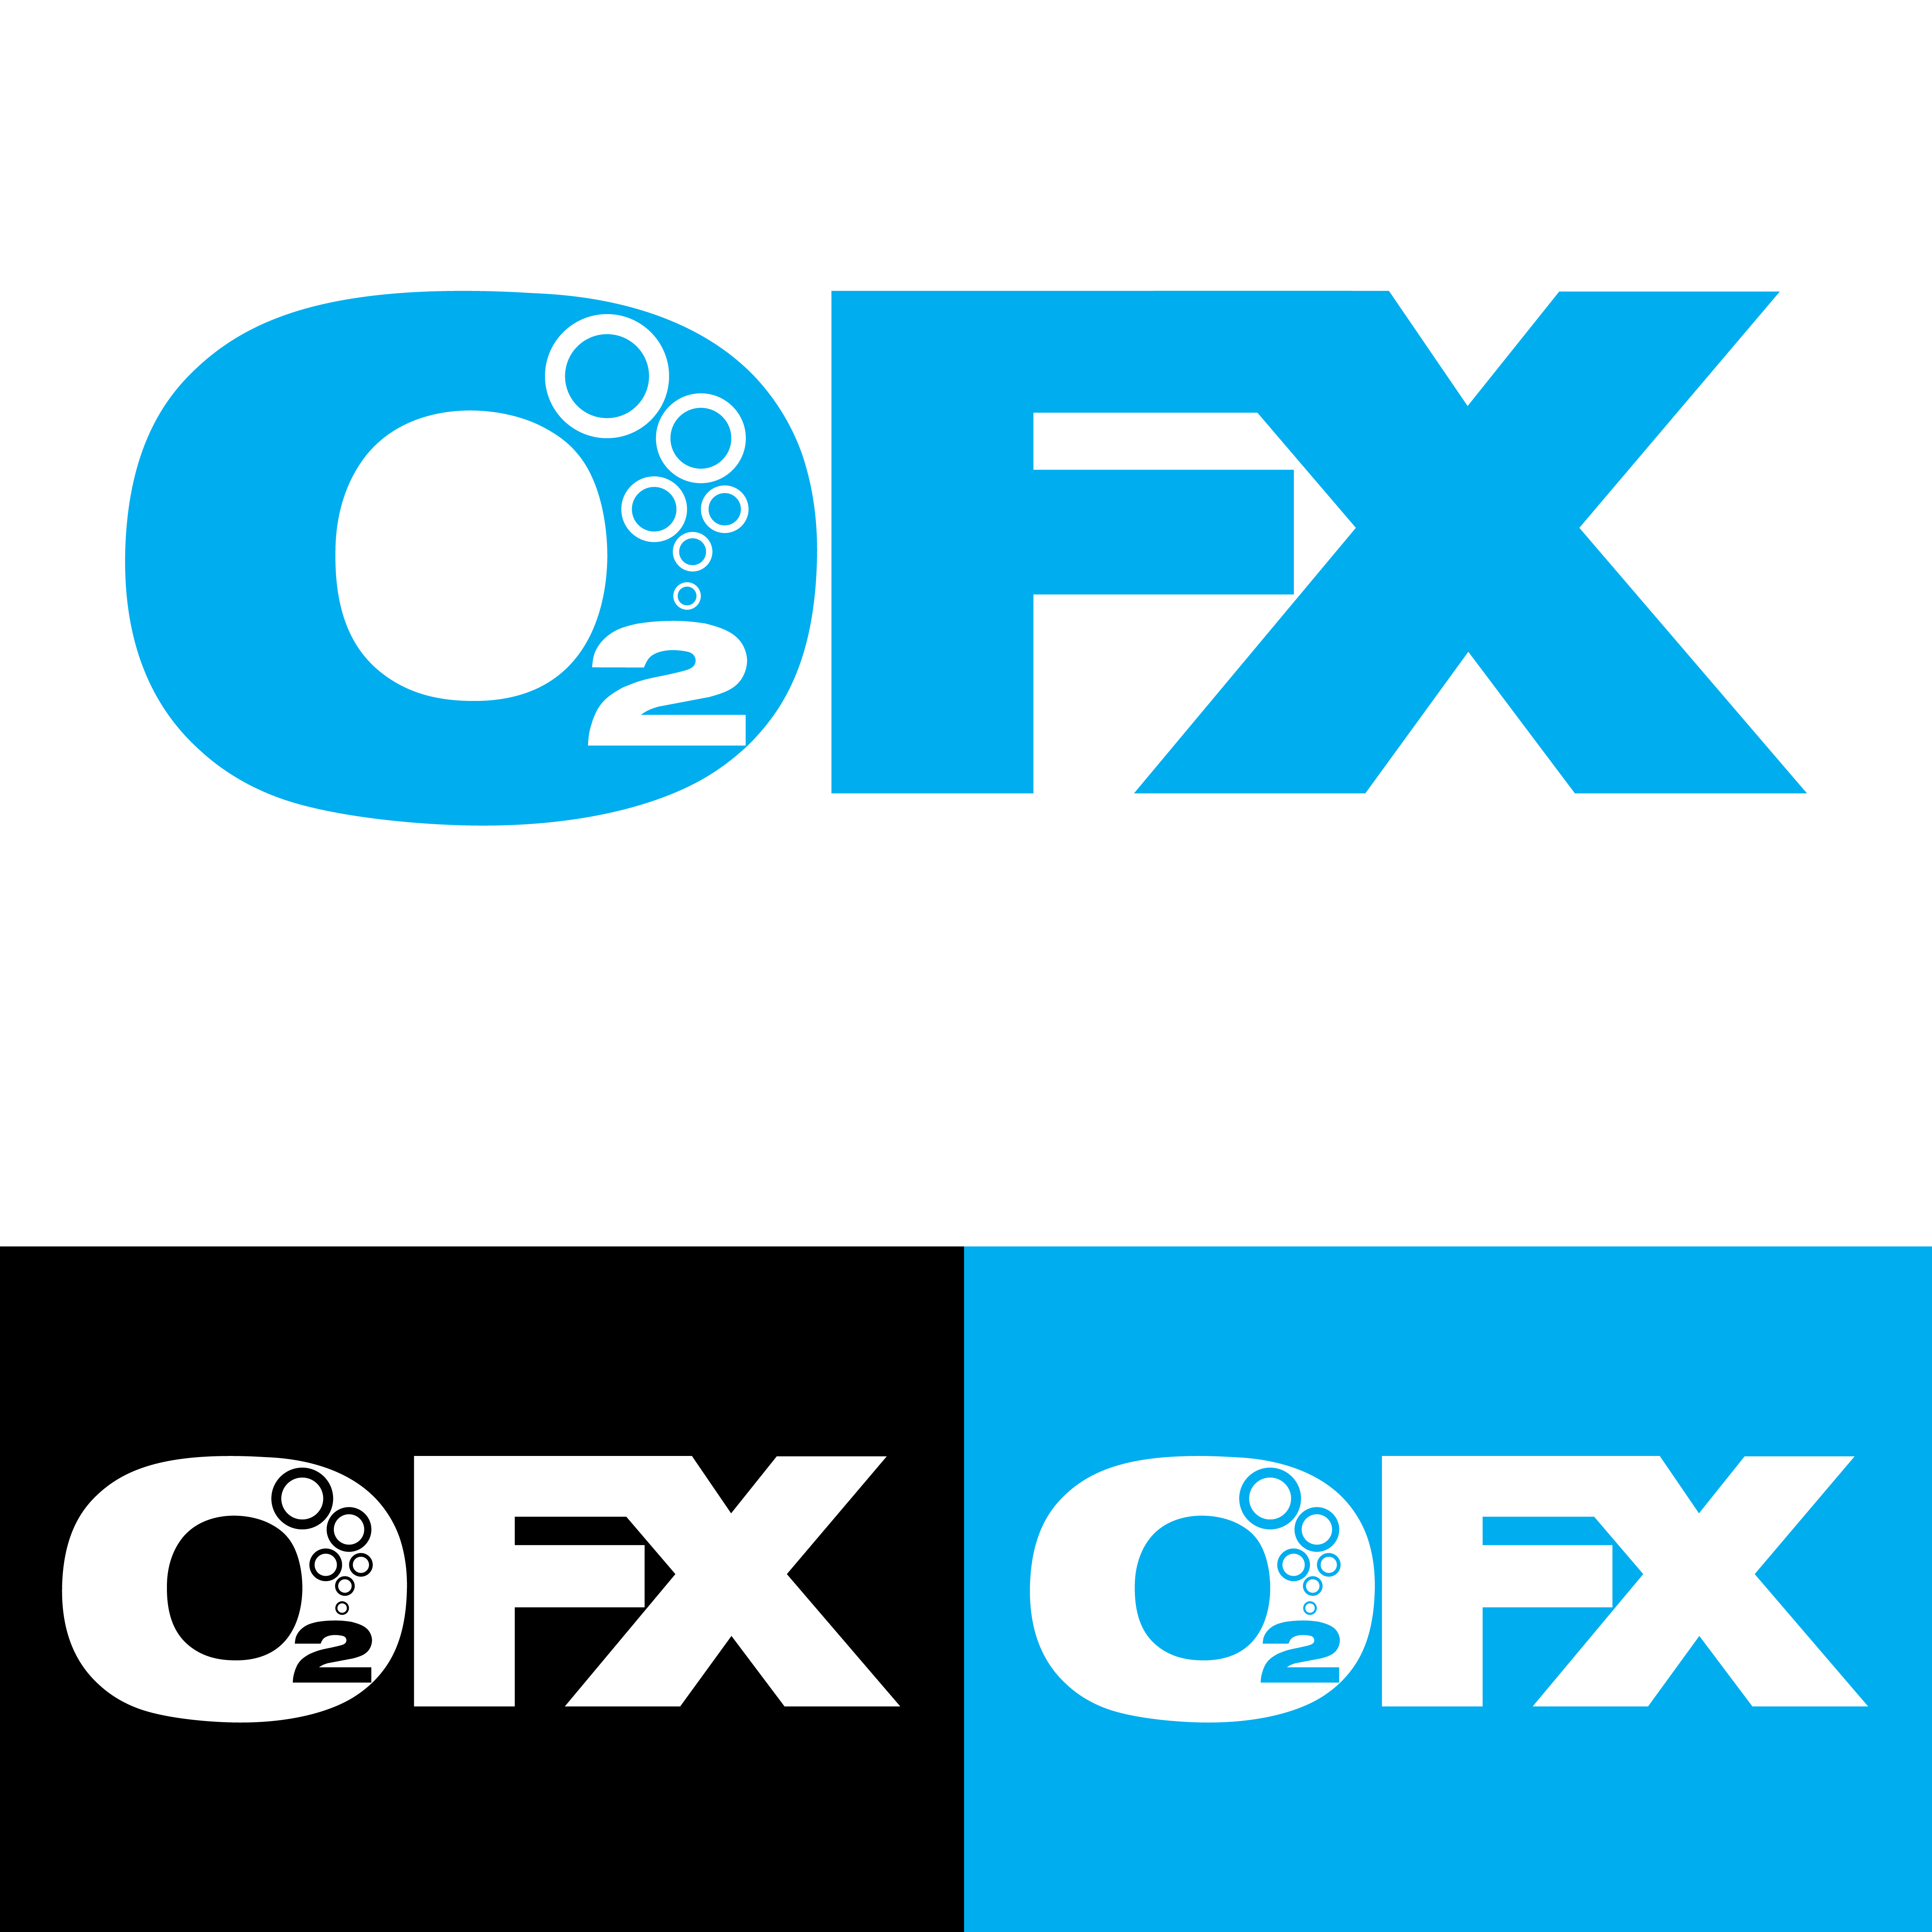 Logo Design by Private User - Entry No. 34 in the Logo Design Contest Captivating Logo Design for O2FX.